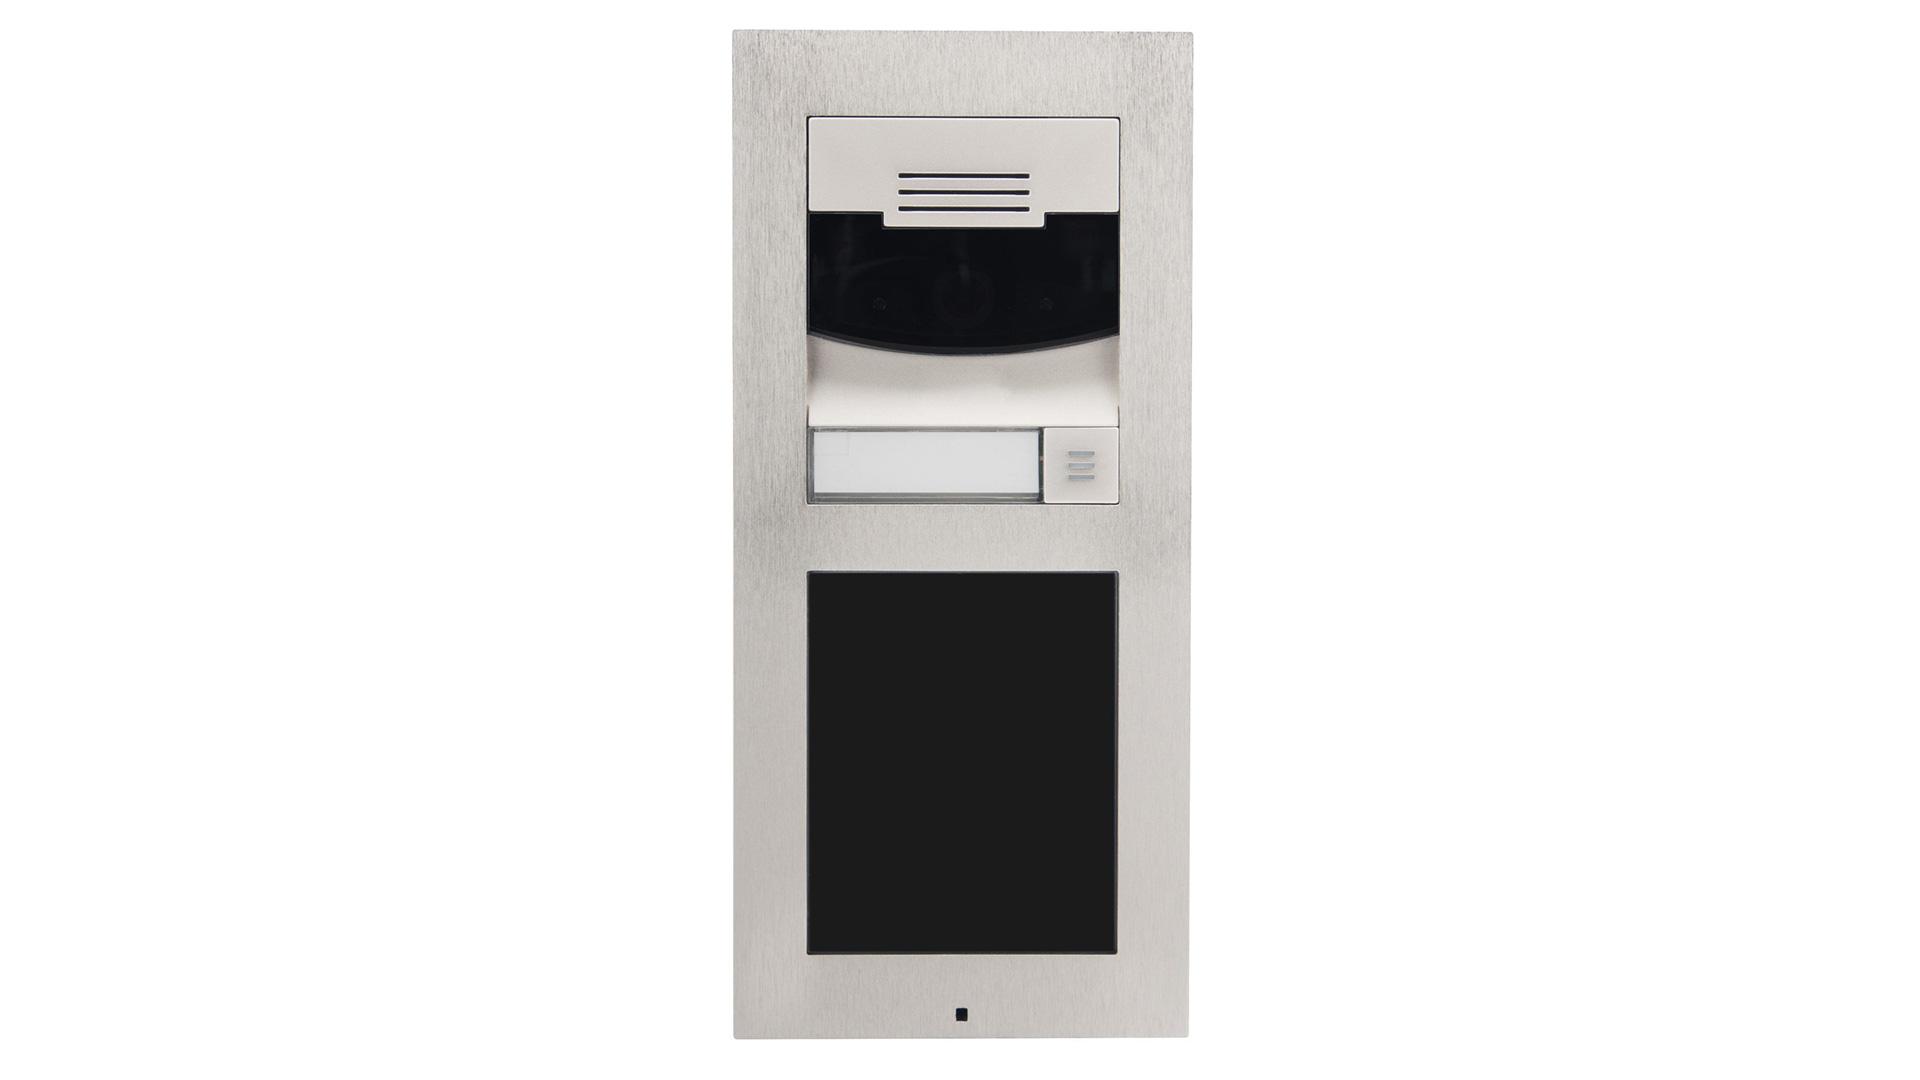 Control4 DS2 Door Station at Creative Audio in Winnipeg (Brushed Nickel)